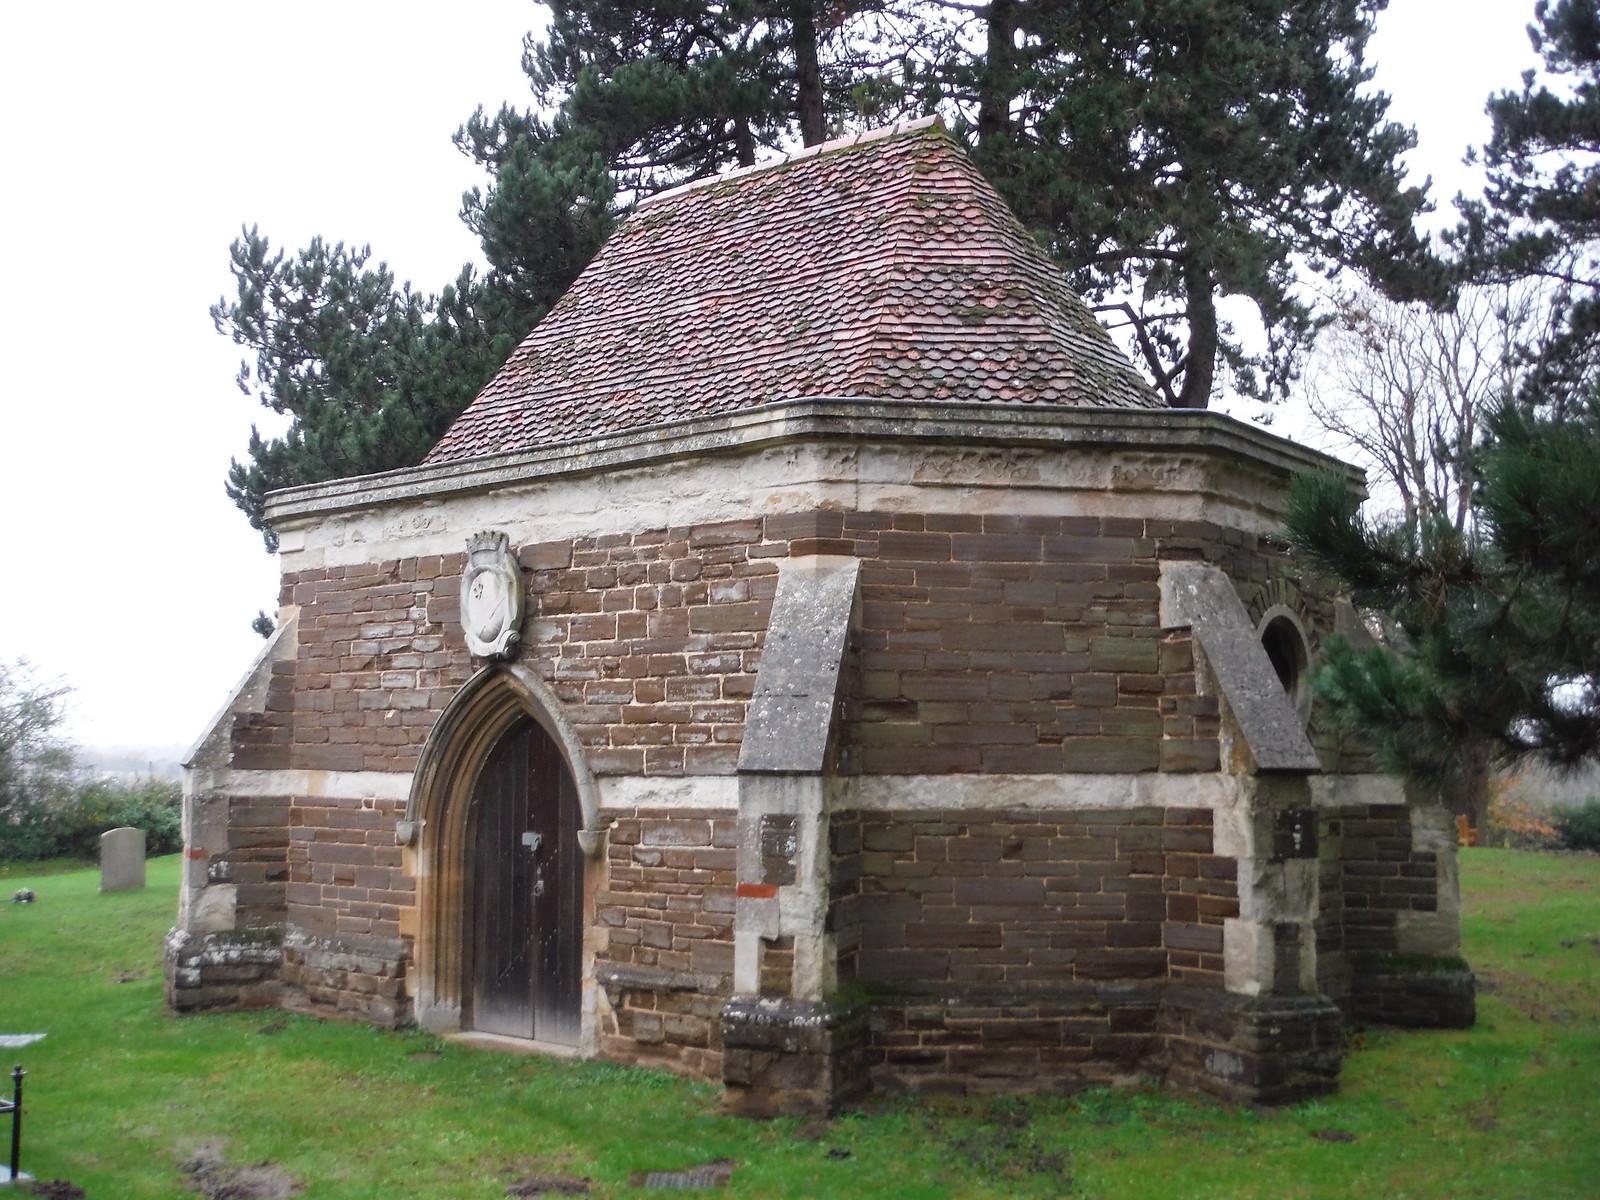 Ailesbury Mausoleum & Crypt, Maulden (I) SWC Walk 232 Lidlington to Flitwick